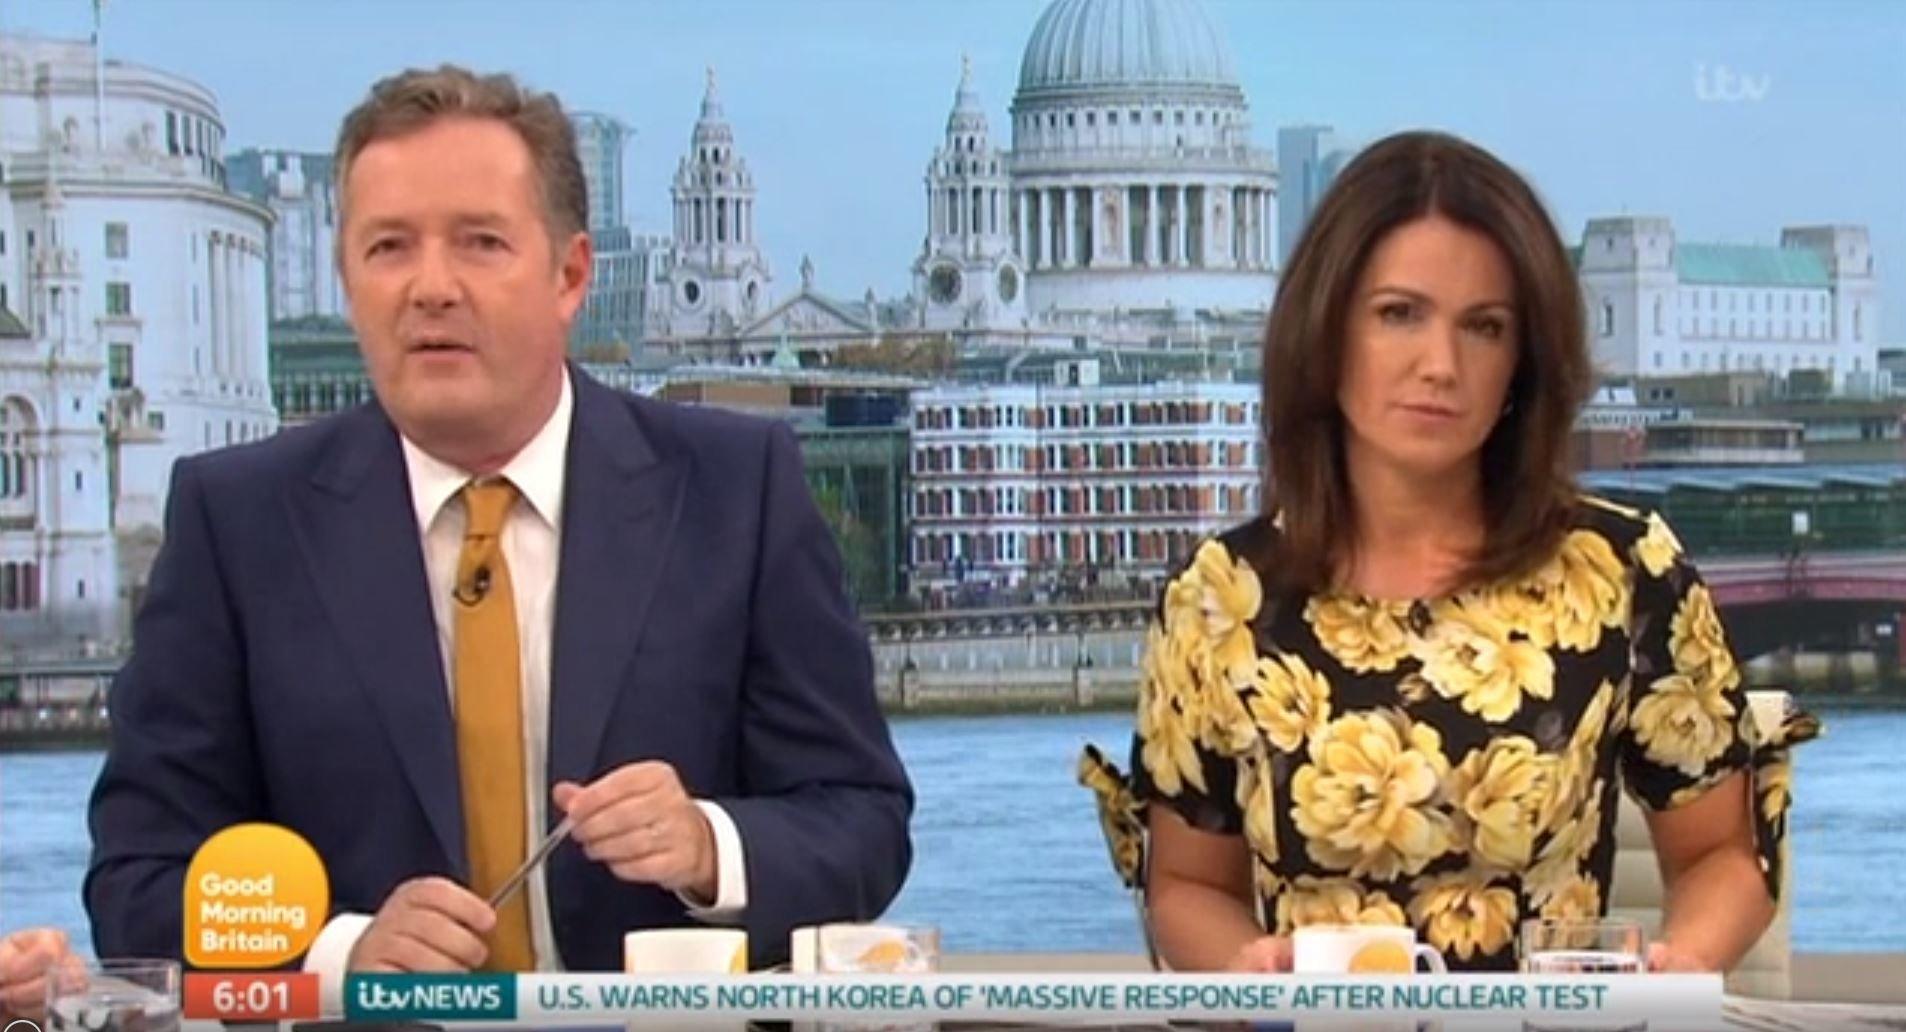 Piers Morgan and Susanna Reid returned to work on